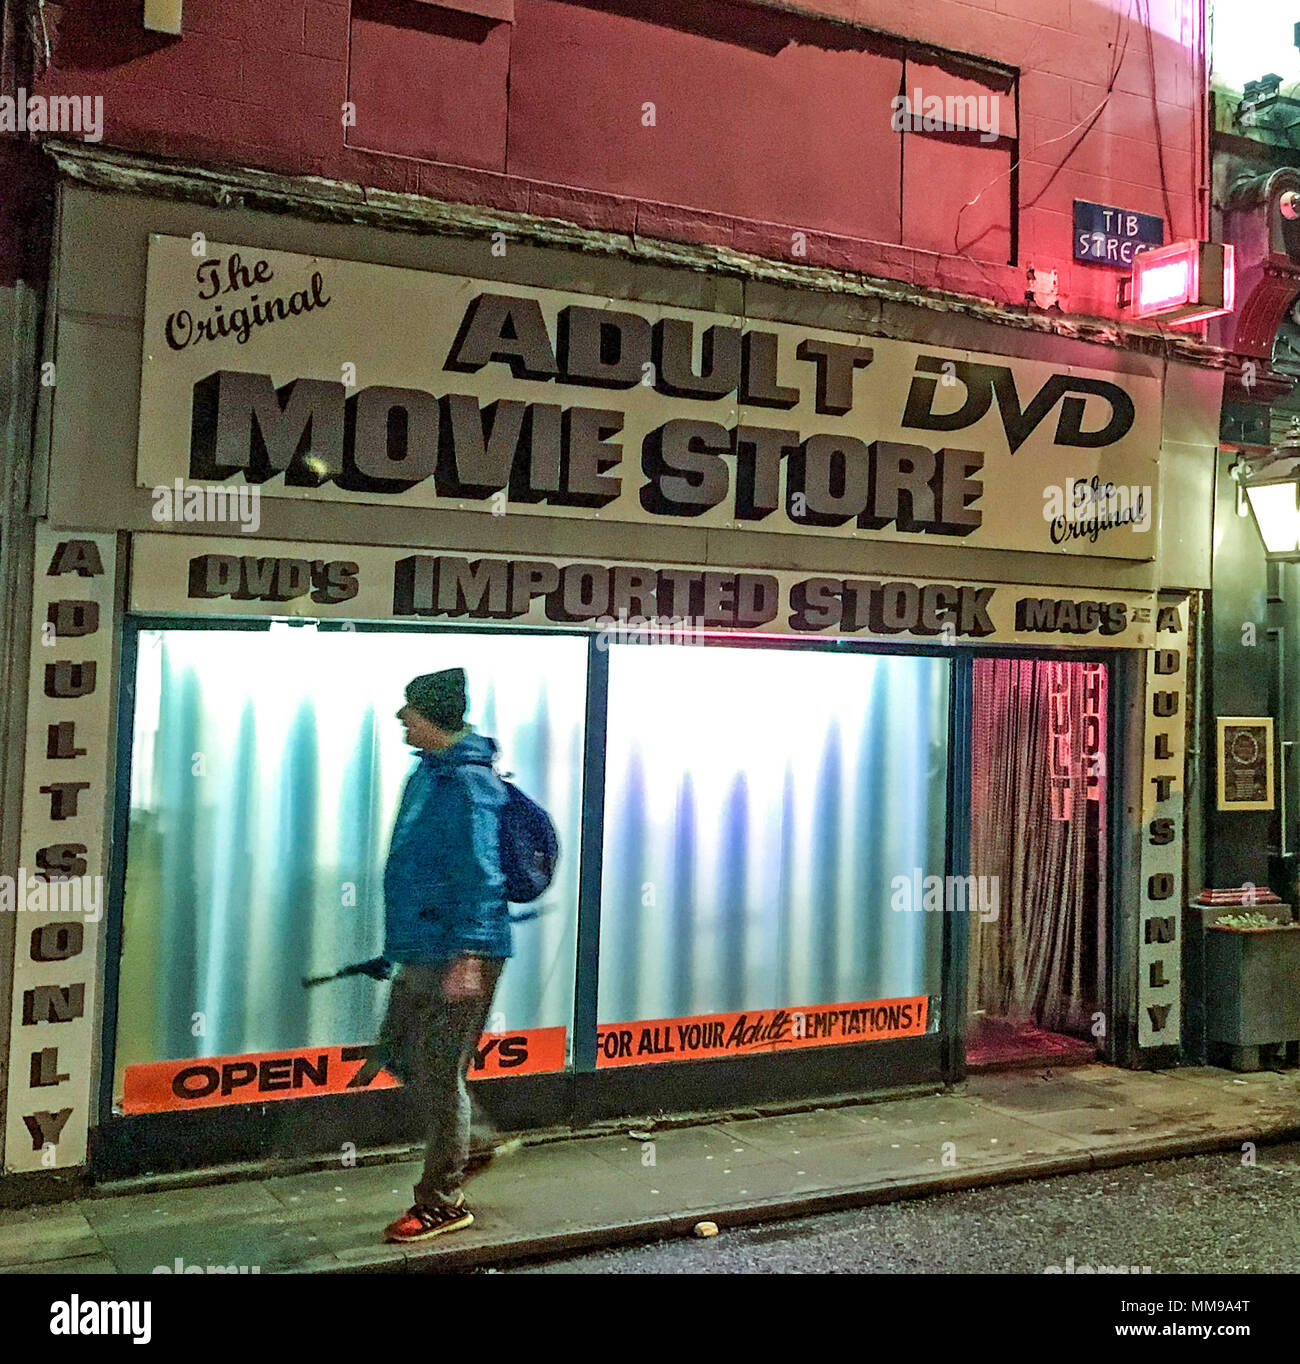 Adult DVD Movie Store, Tib Street Manchester, Lancs, England, UK Stock Photo